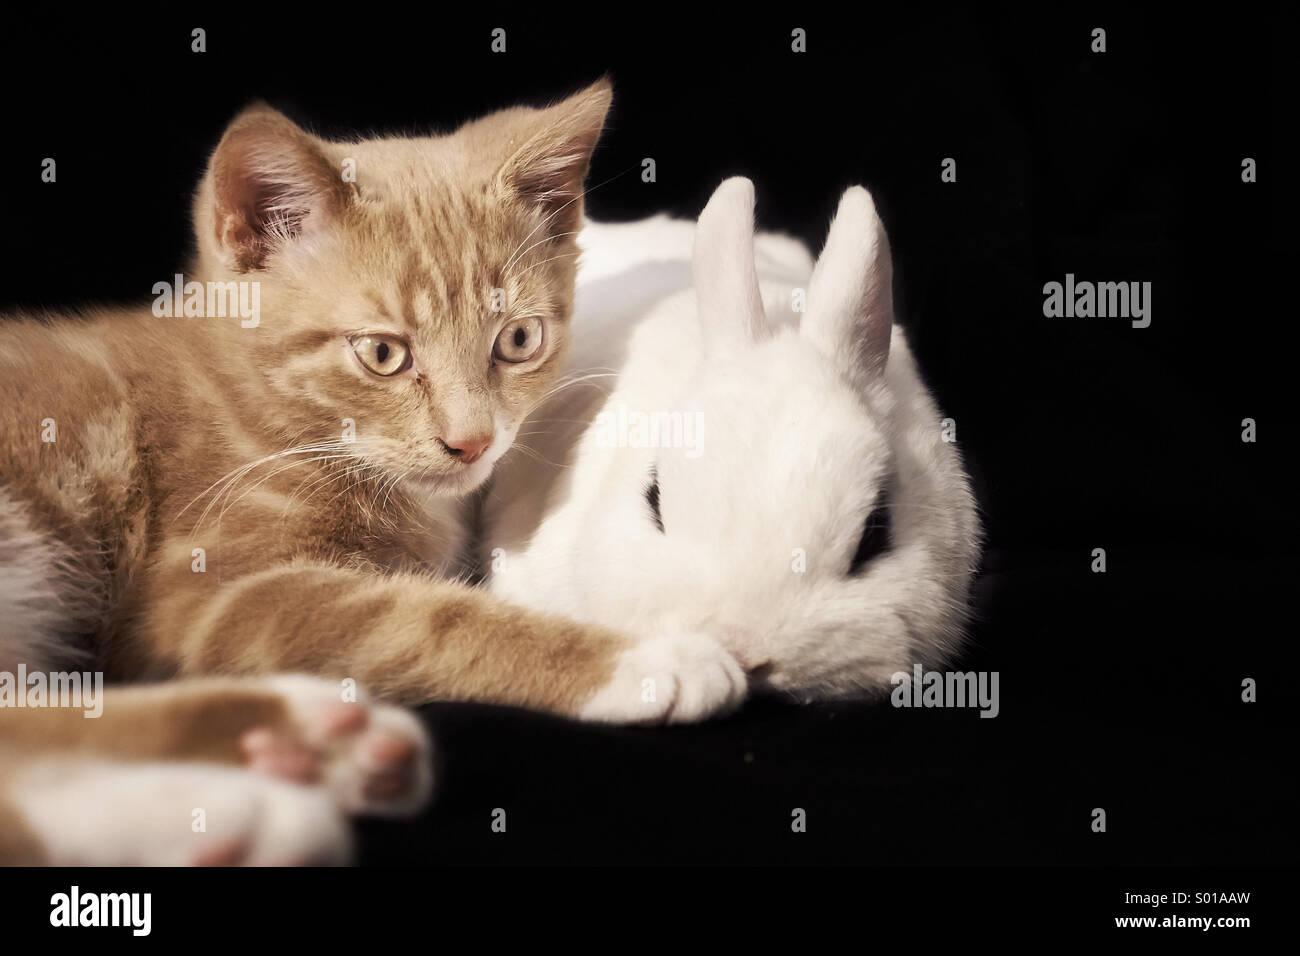 Cat and rabbit cuddle - Stock Image